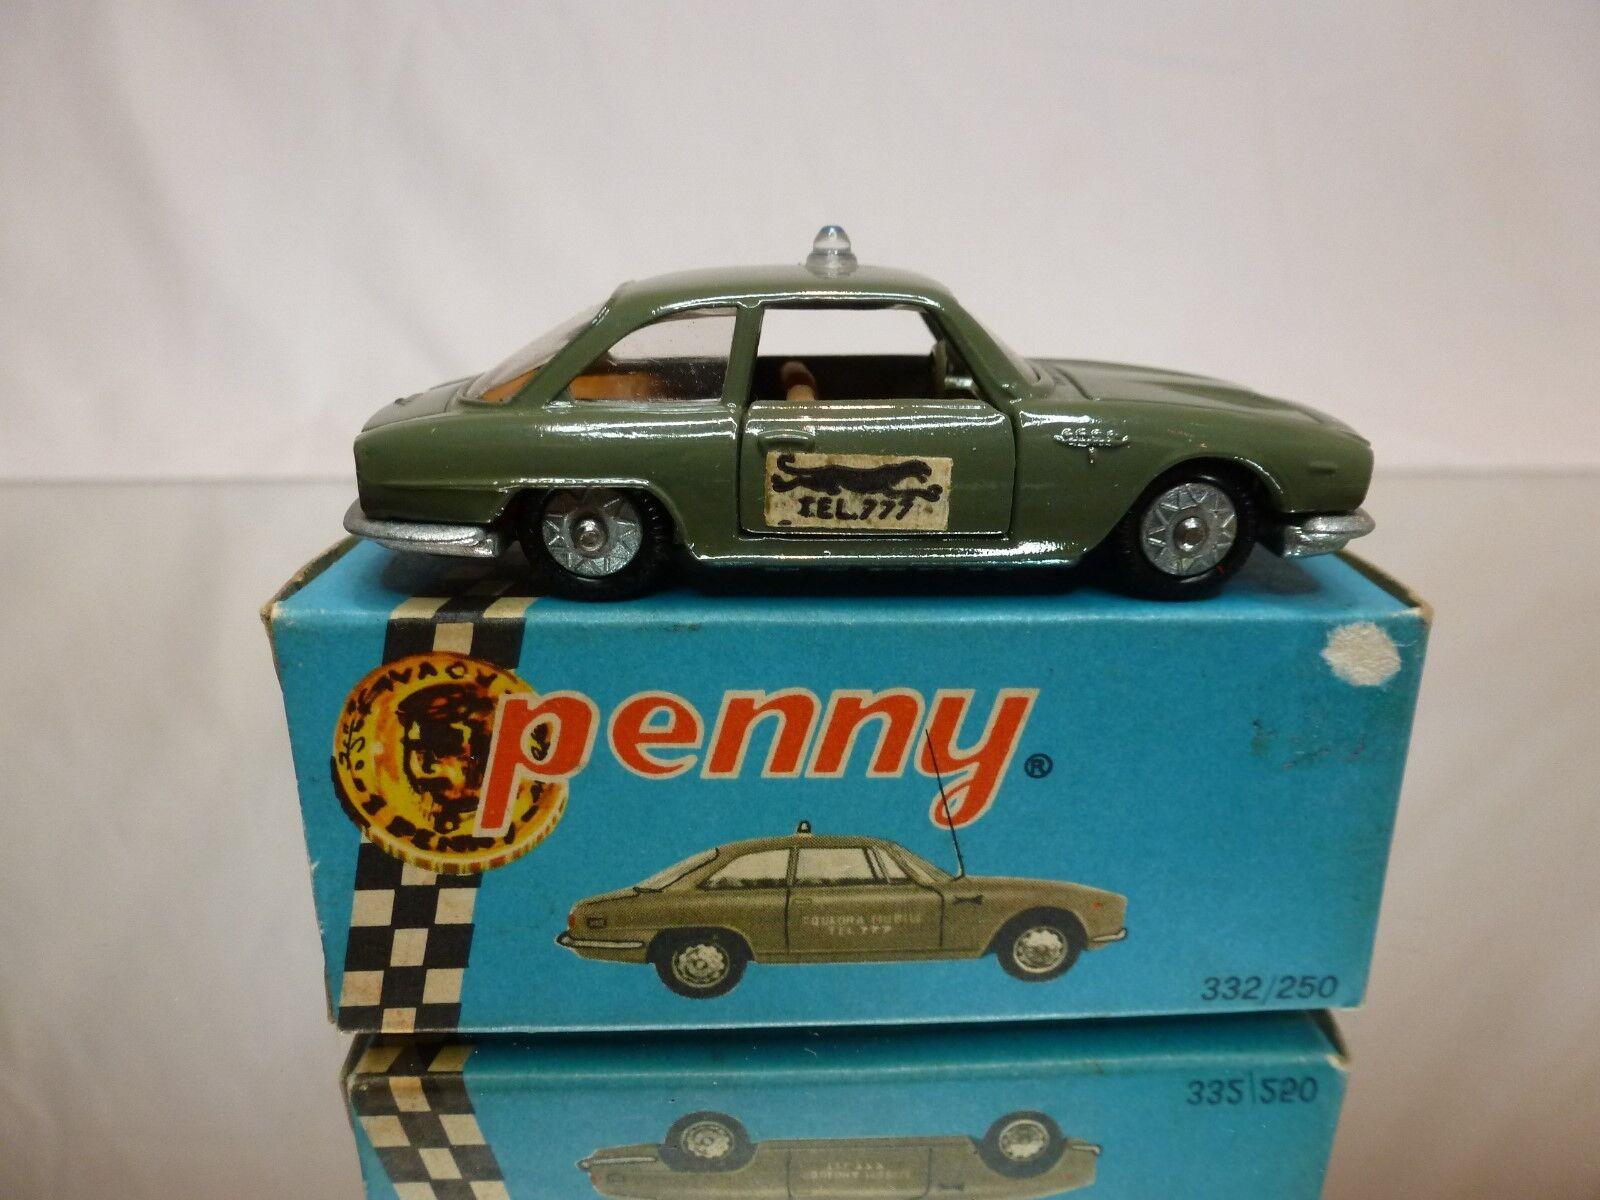 PENNY 1 66 ALFA ROMEO 2600 PANTERA  - GOOD CONDITION IN BOX - EXTREMELY RARE